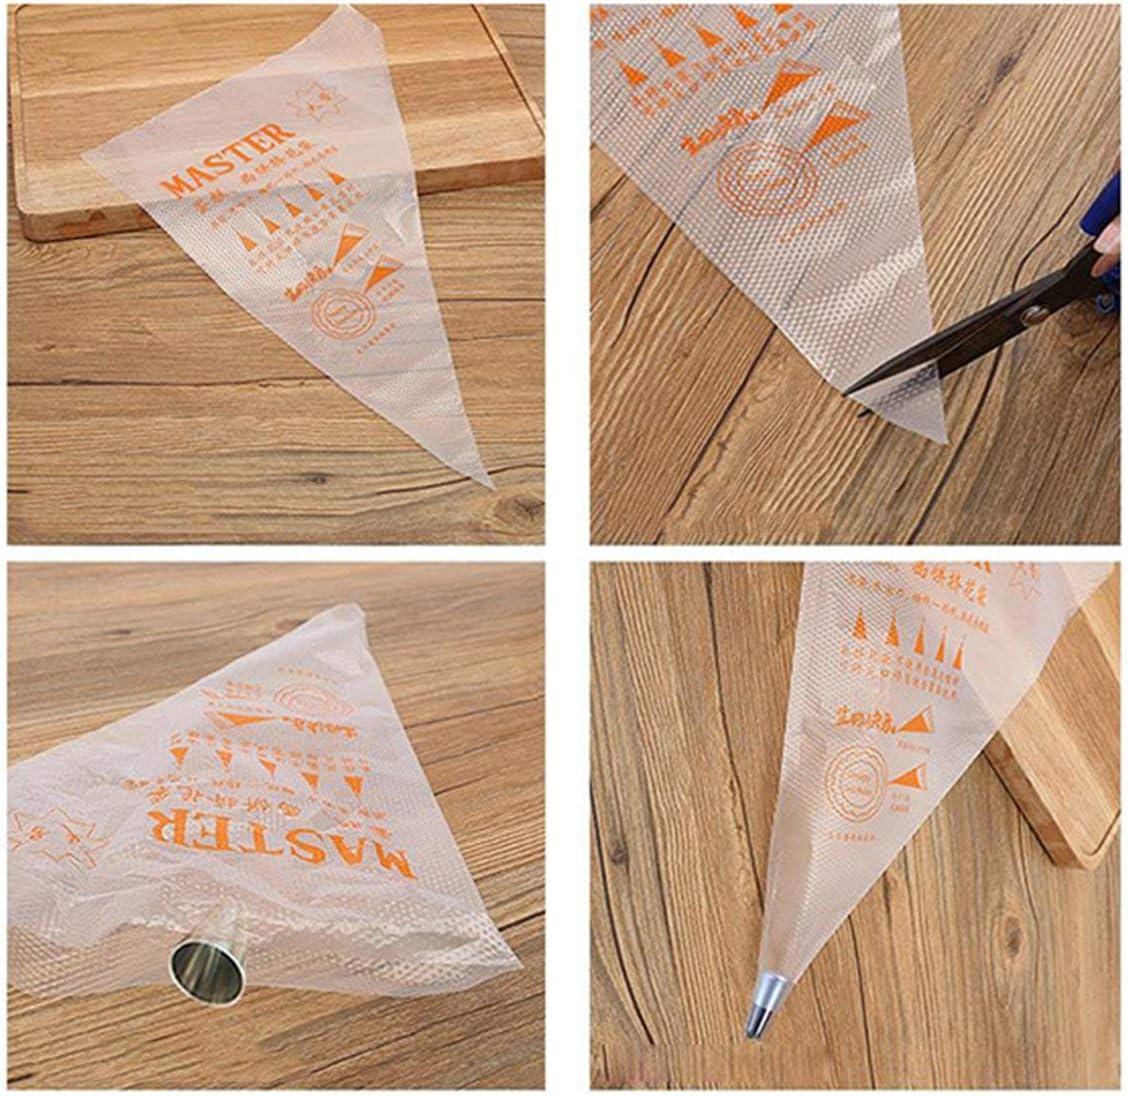 MarinoBIRD 100 Thick Plastic Disposable Pastry Bag Icing Piping Cake Cupcake Decorating Bag